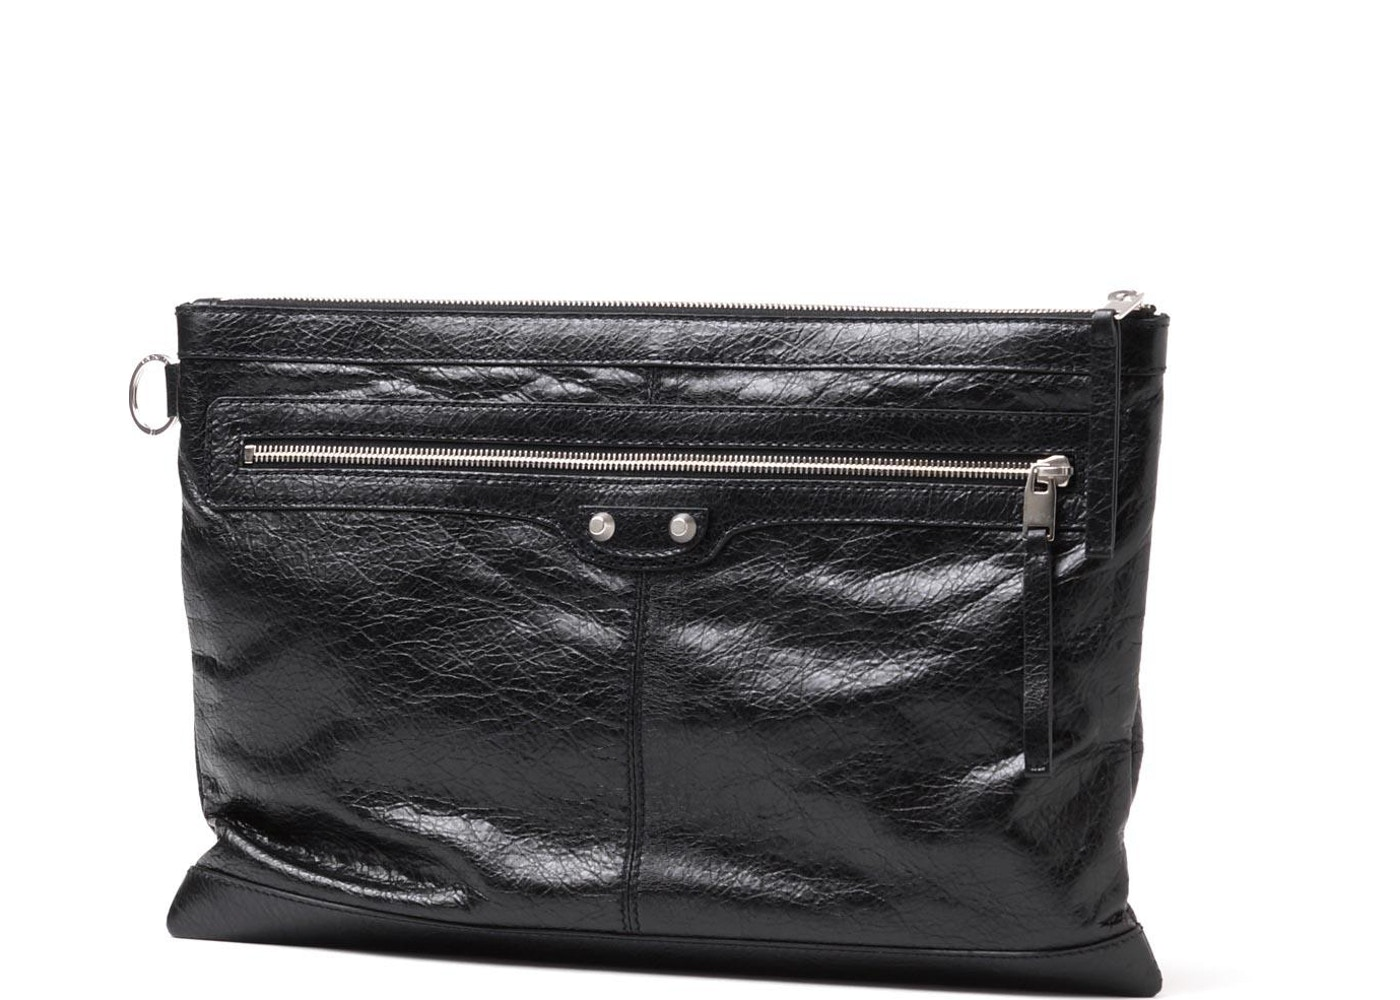 9d11ec72fe Balenciaga Clutch Oversized Black. Oversized Black